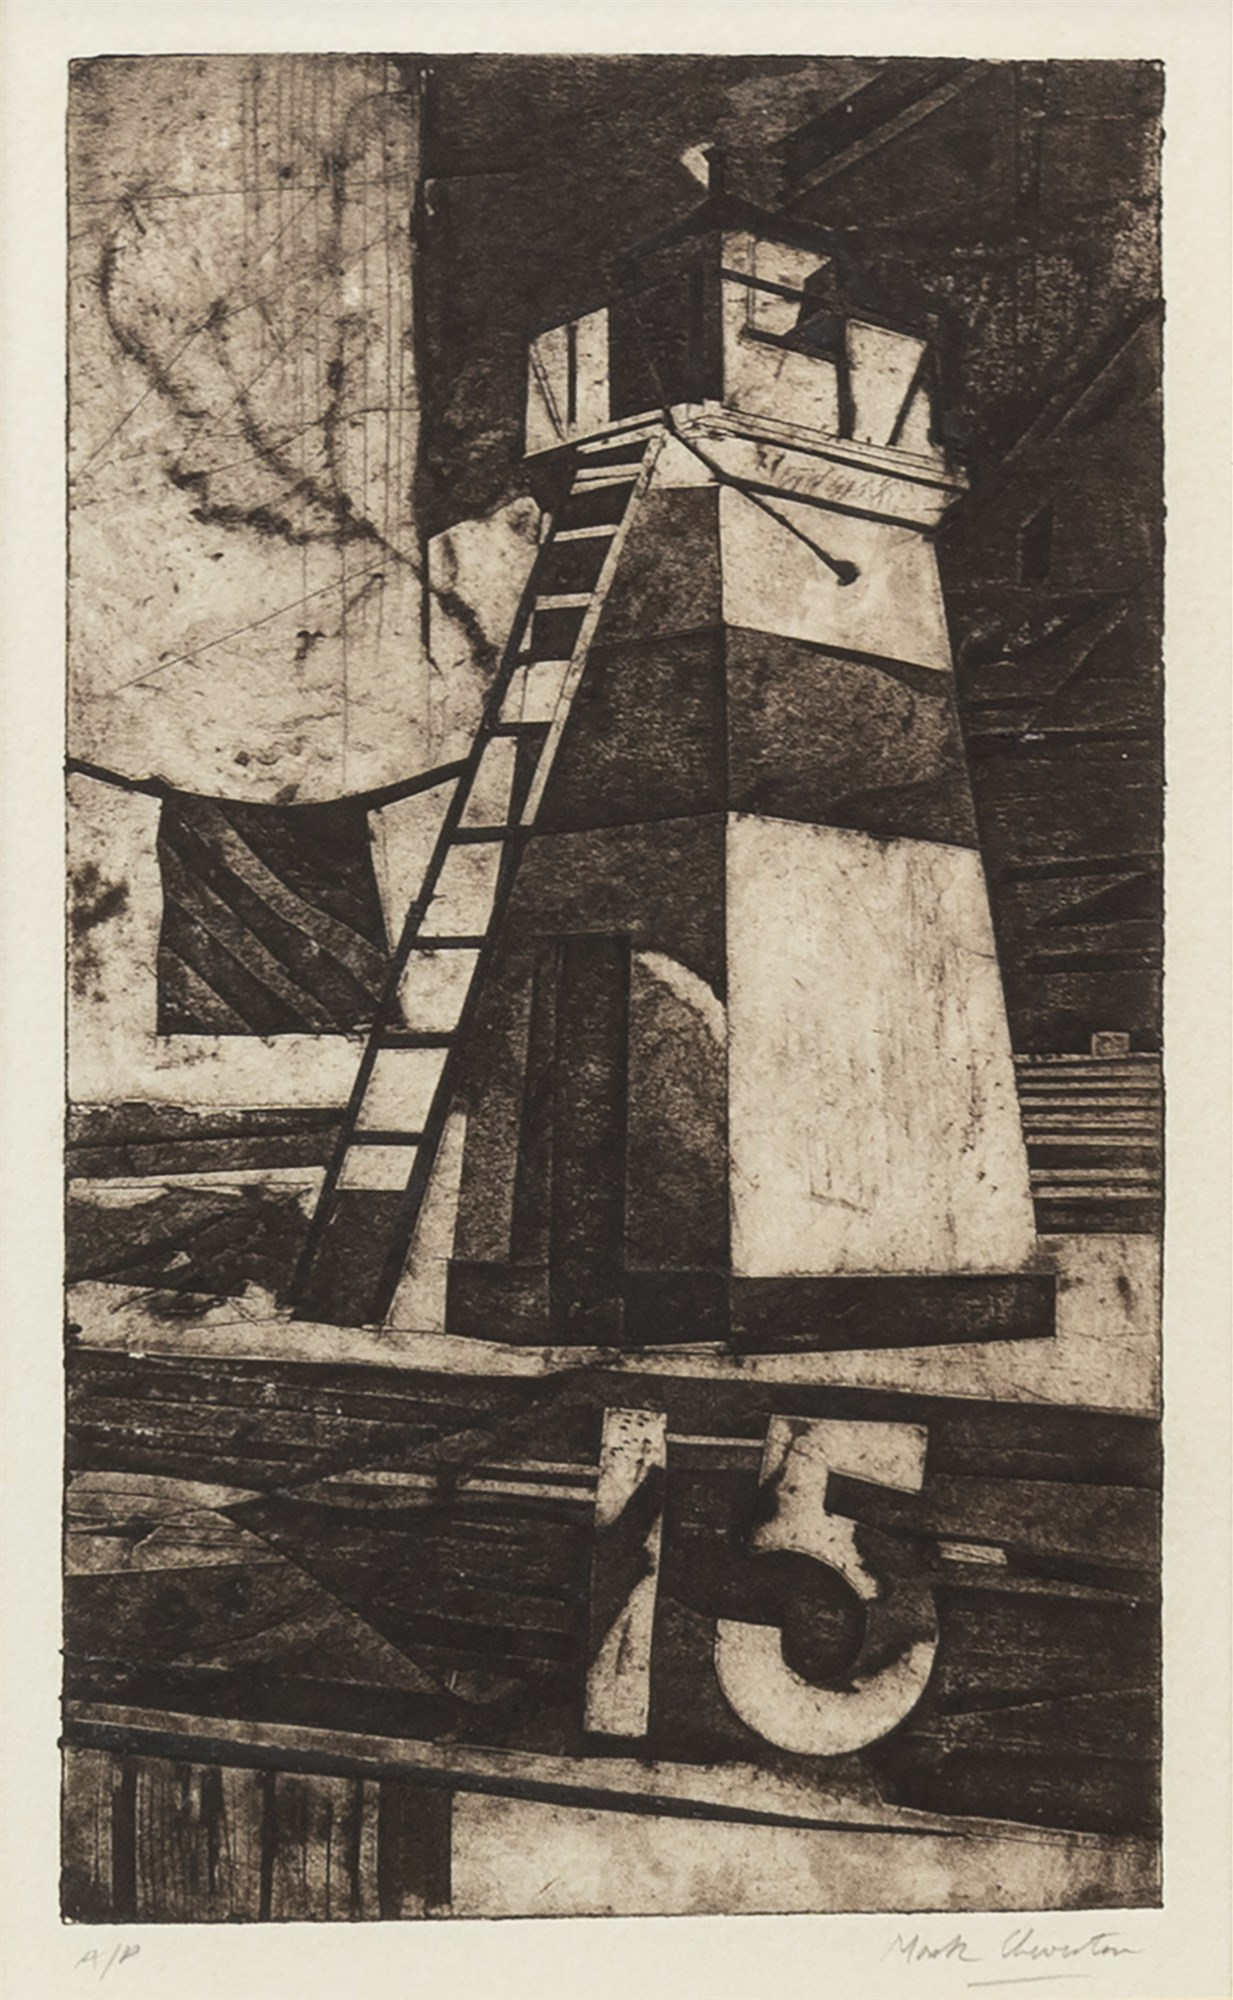 Lot 94 - CRINAN LIGHT, AN ARTIST'S PROOF ETCHING BY MARK CHEVERTON